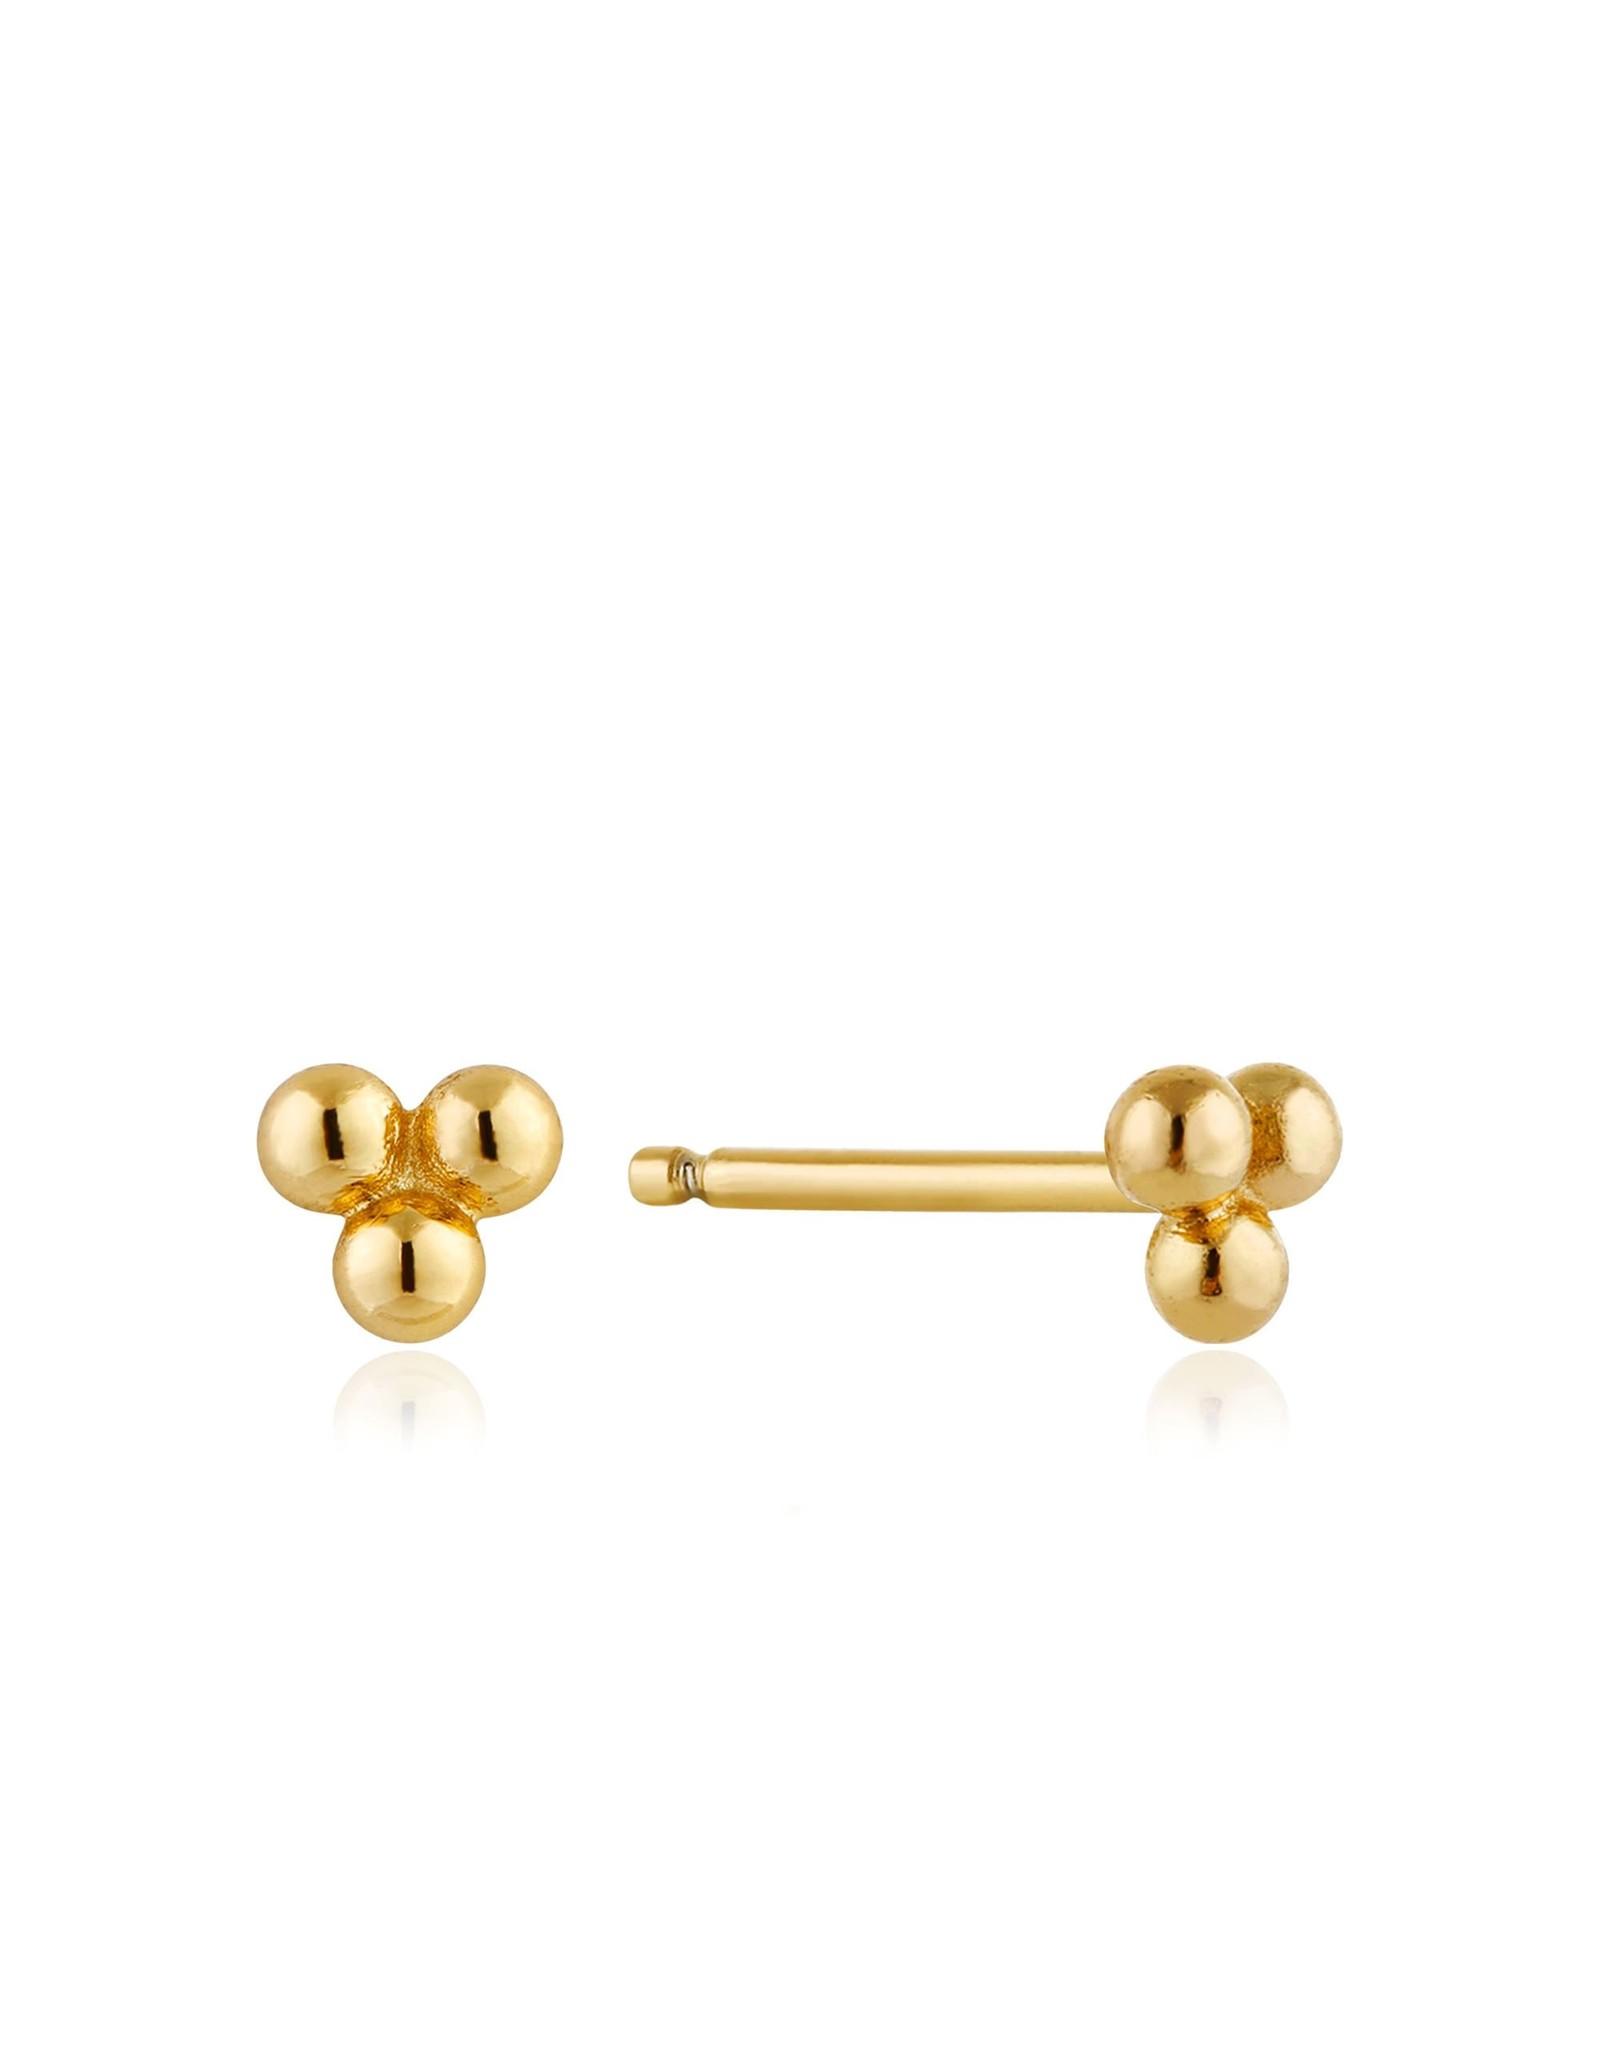 Ania Haie Modern Triple Ball Stud Earrings, Gold